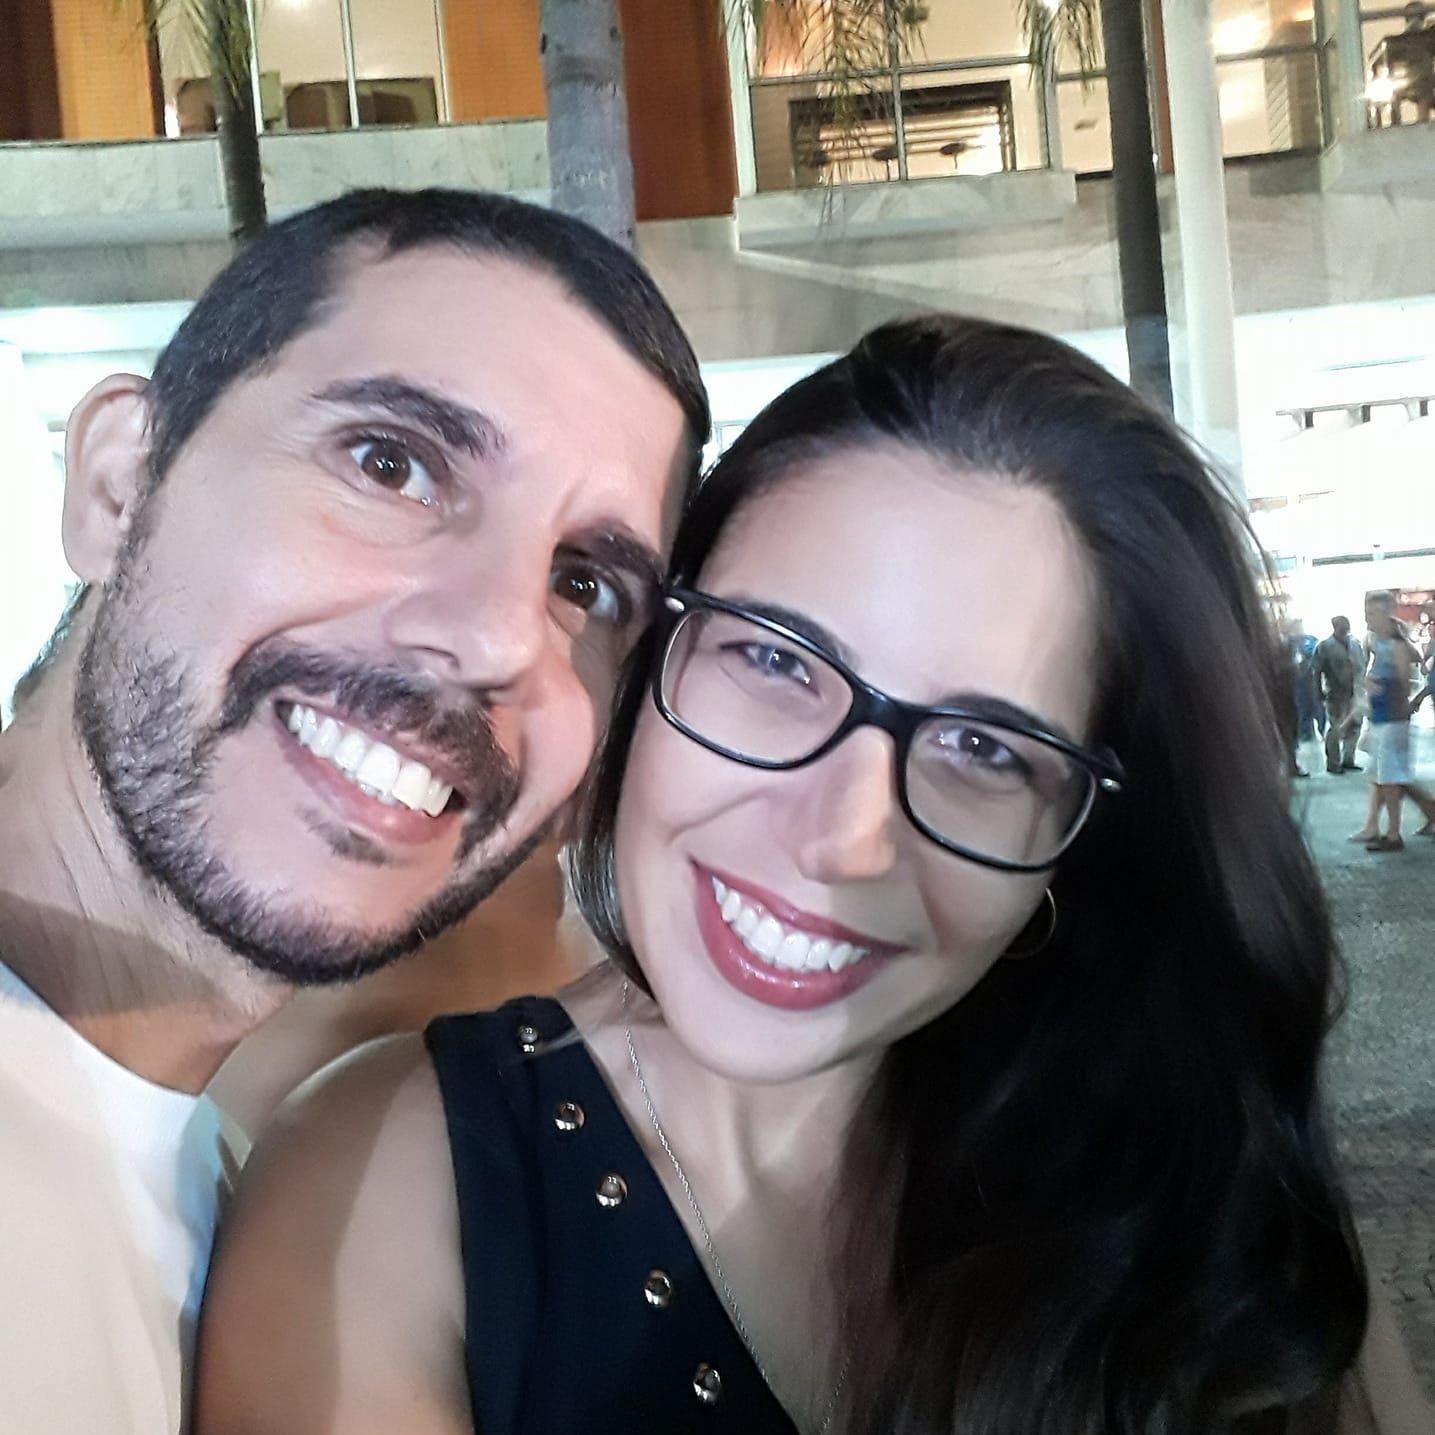 Asaeli tikoirotuma wife sexual dysfunction